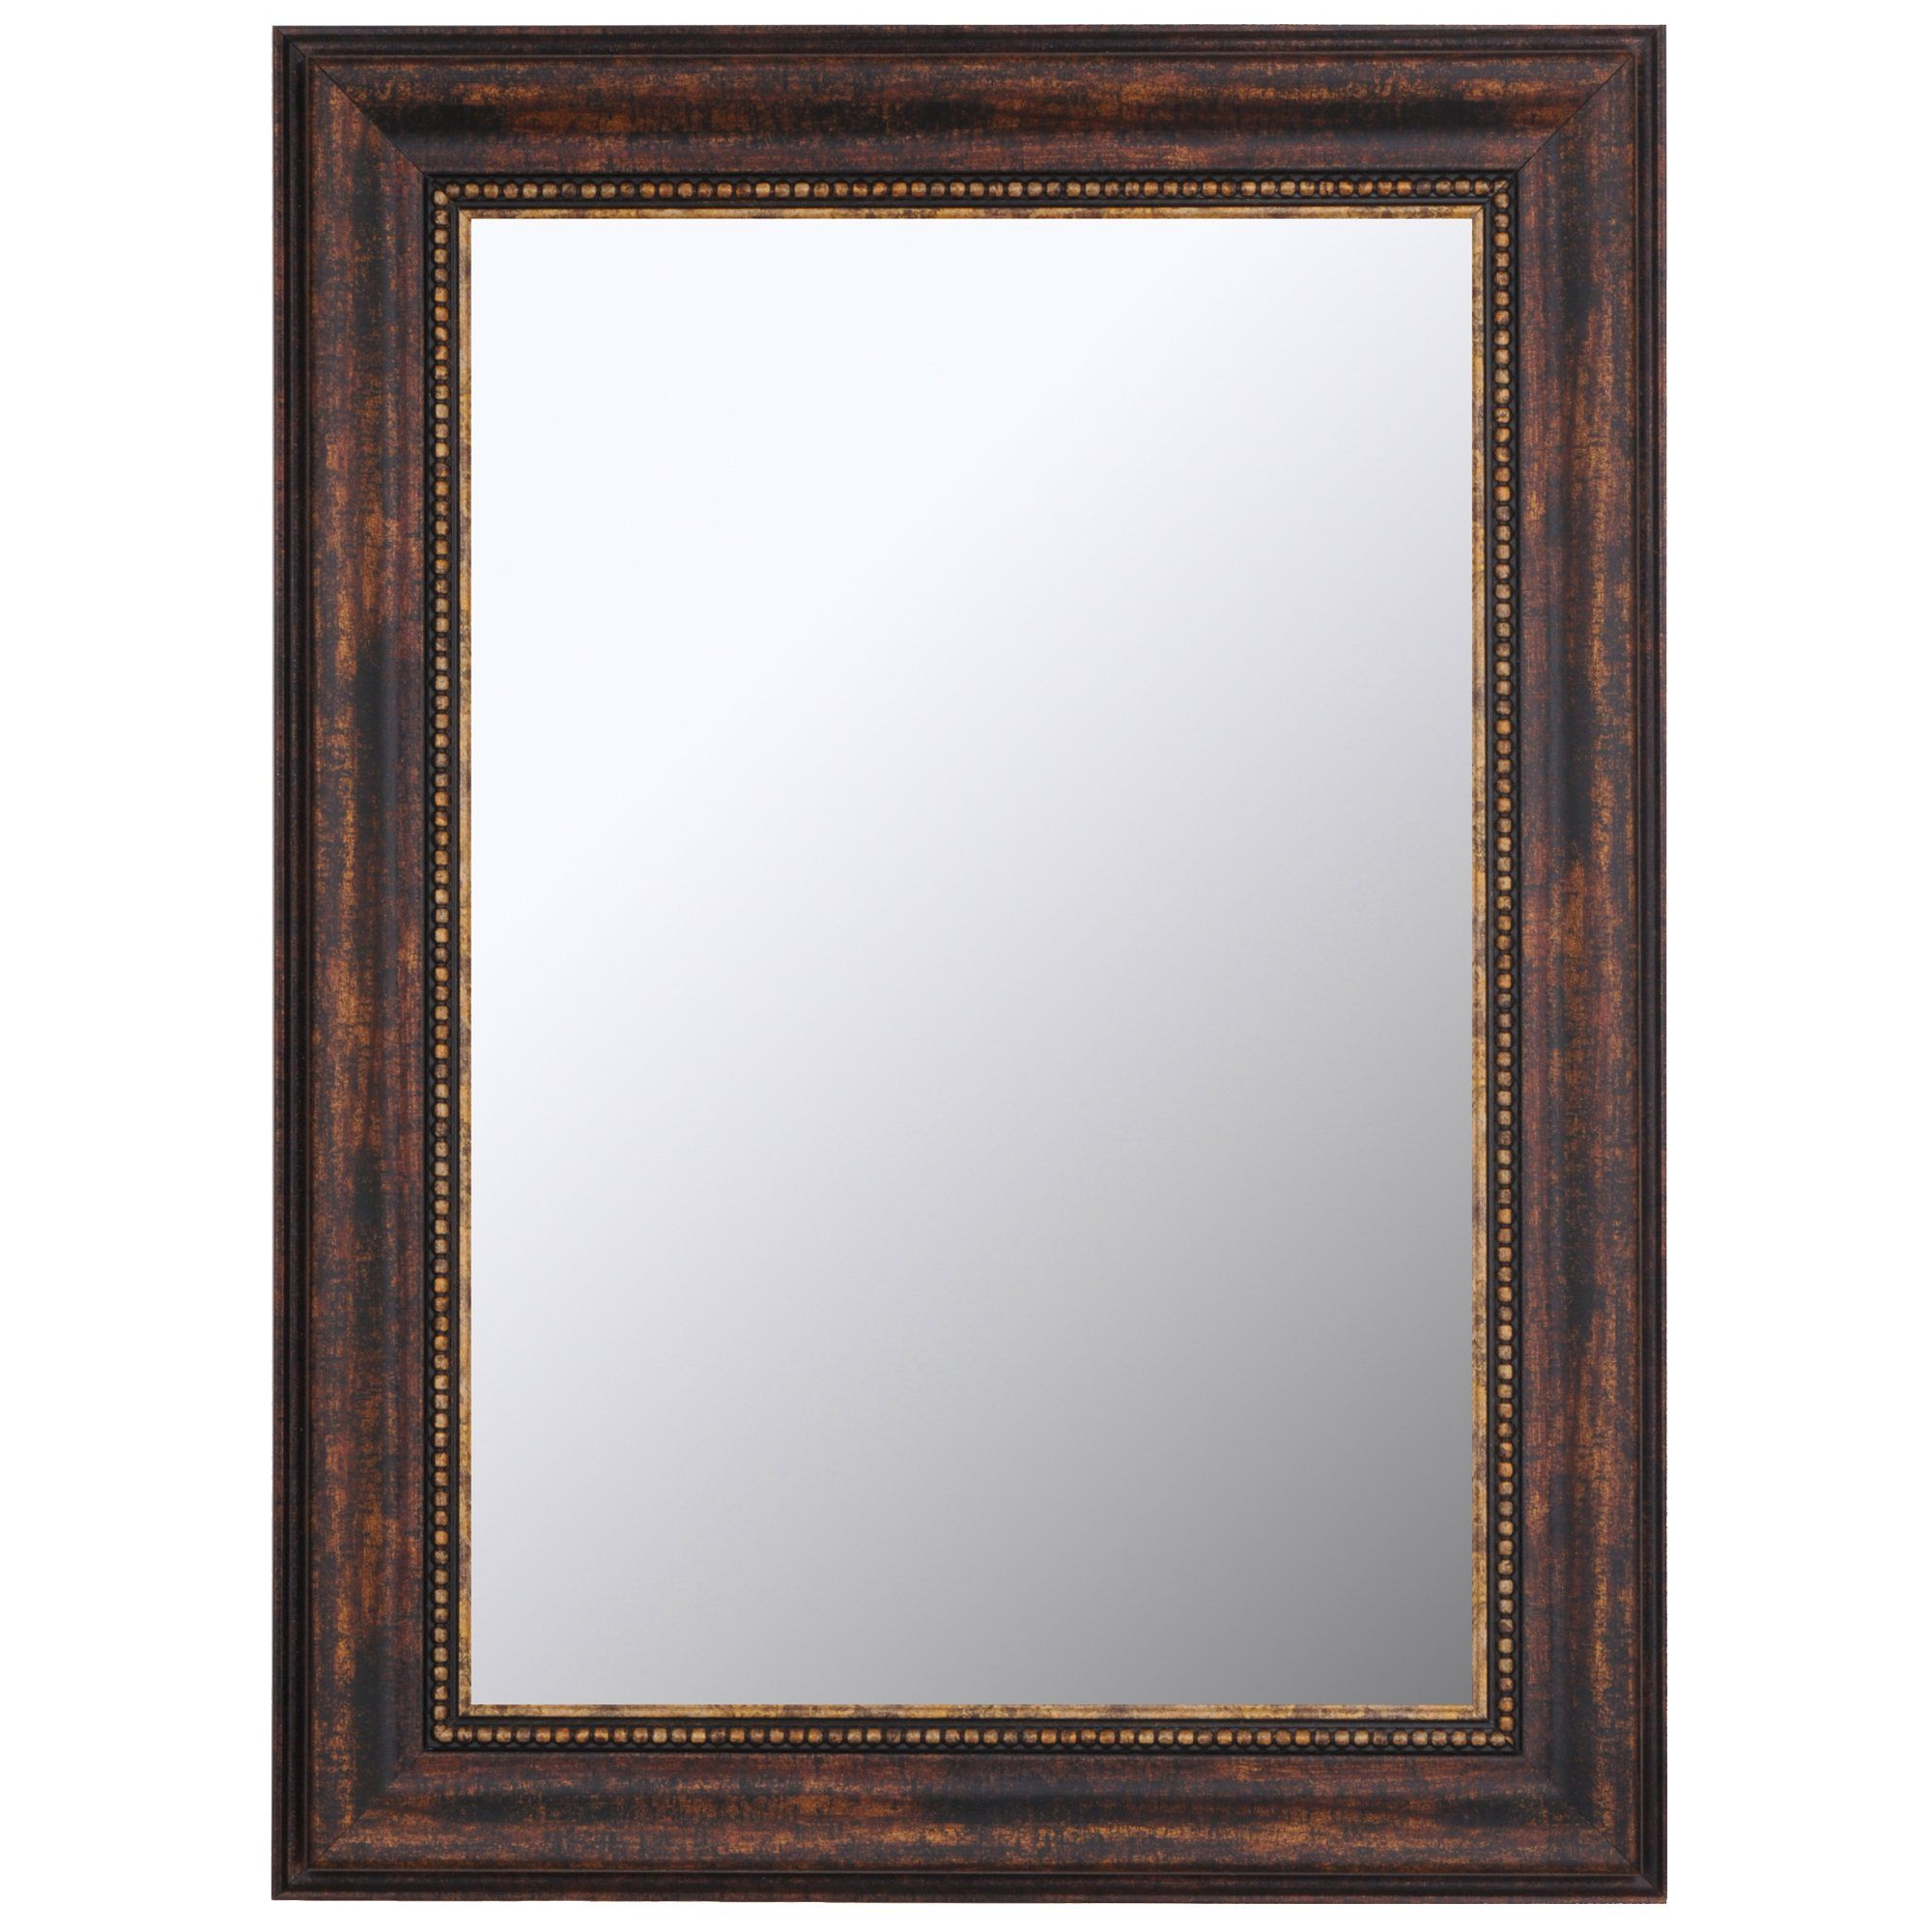 Hitch Erfield Reflections Kazakhstan Beaded Copper Framed Wall Mirror 38 X 48